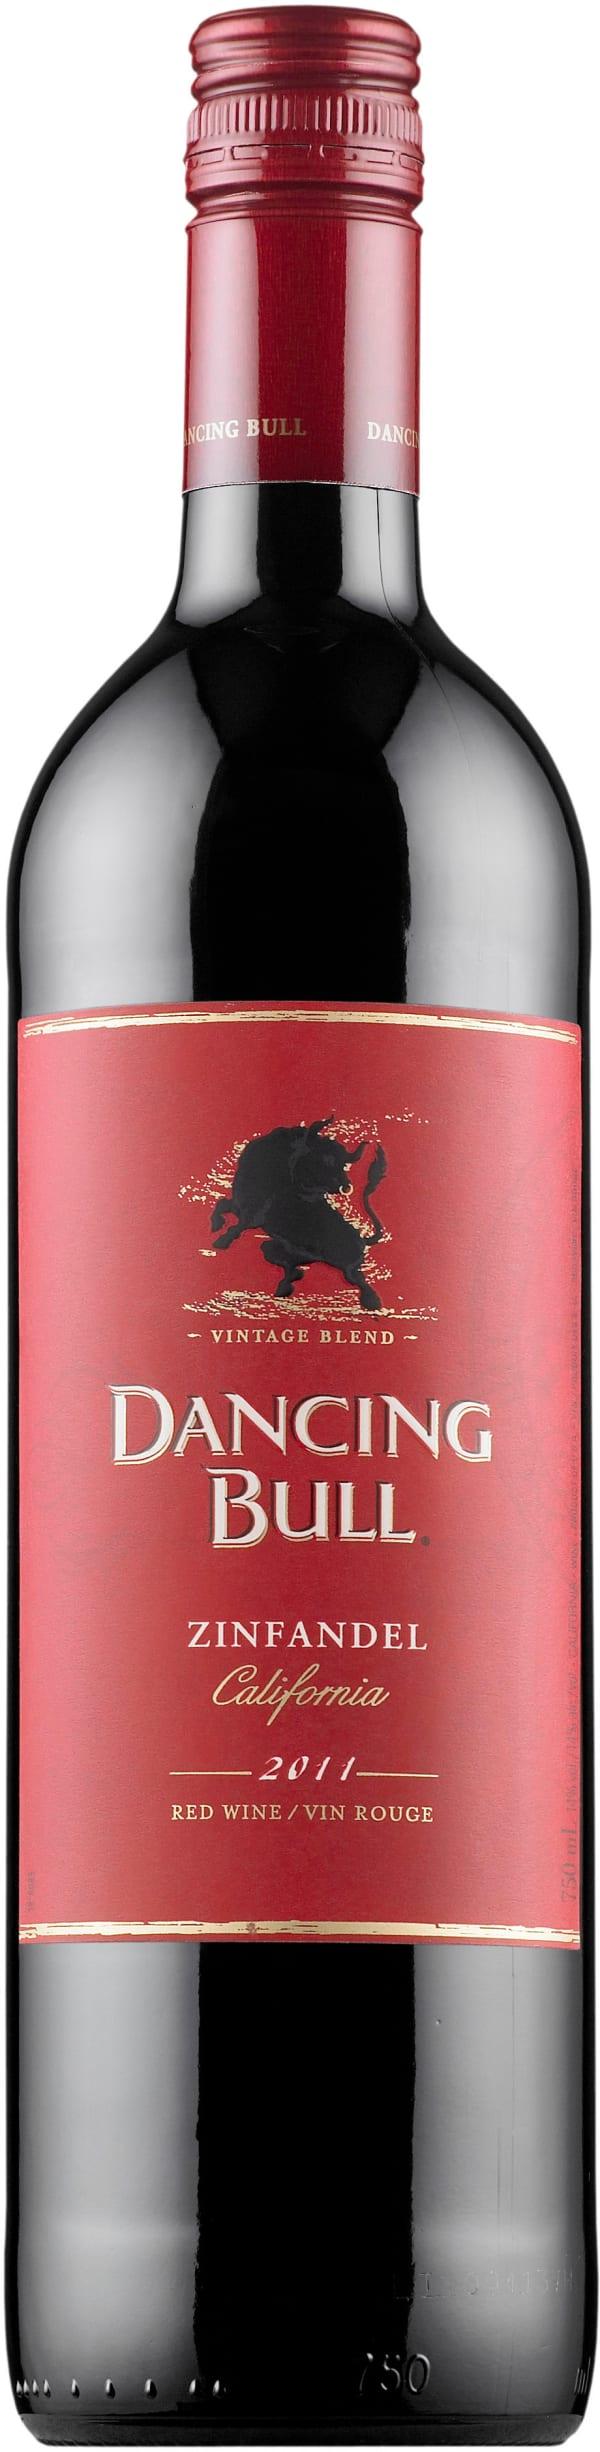 Dancing Bull Zinfandel 2015